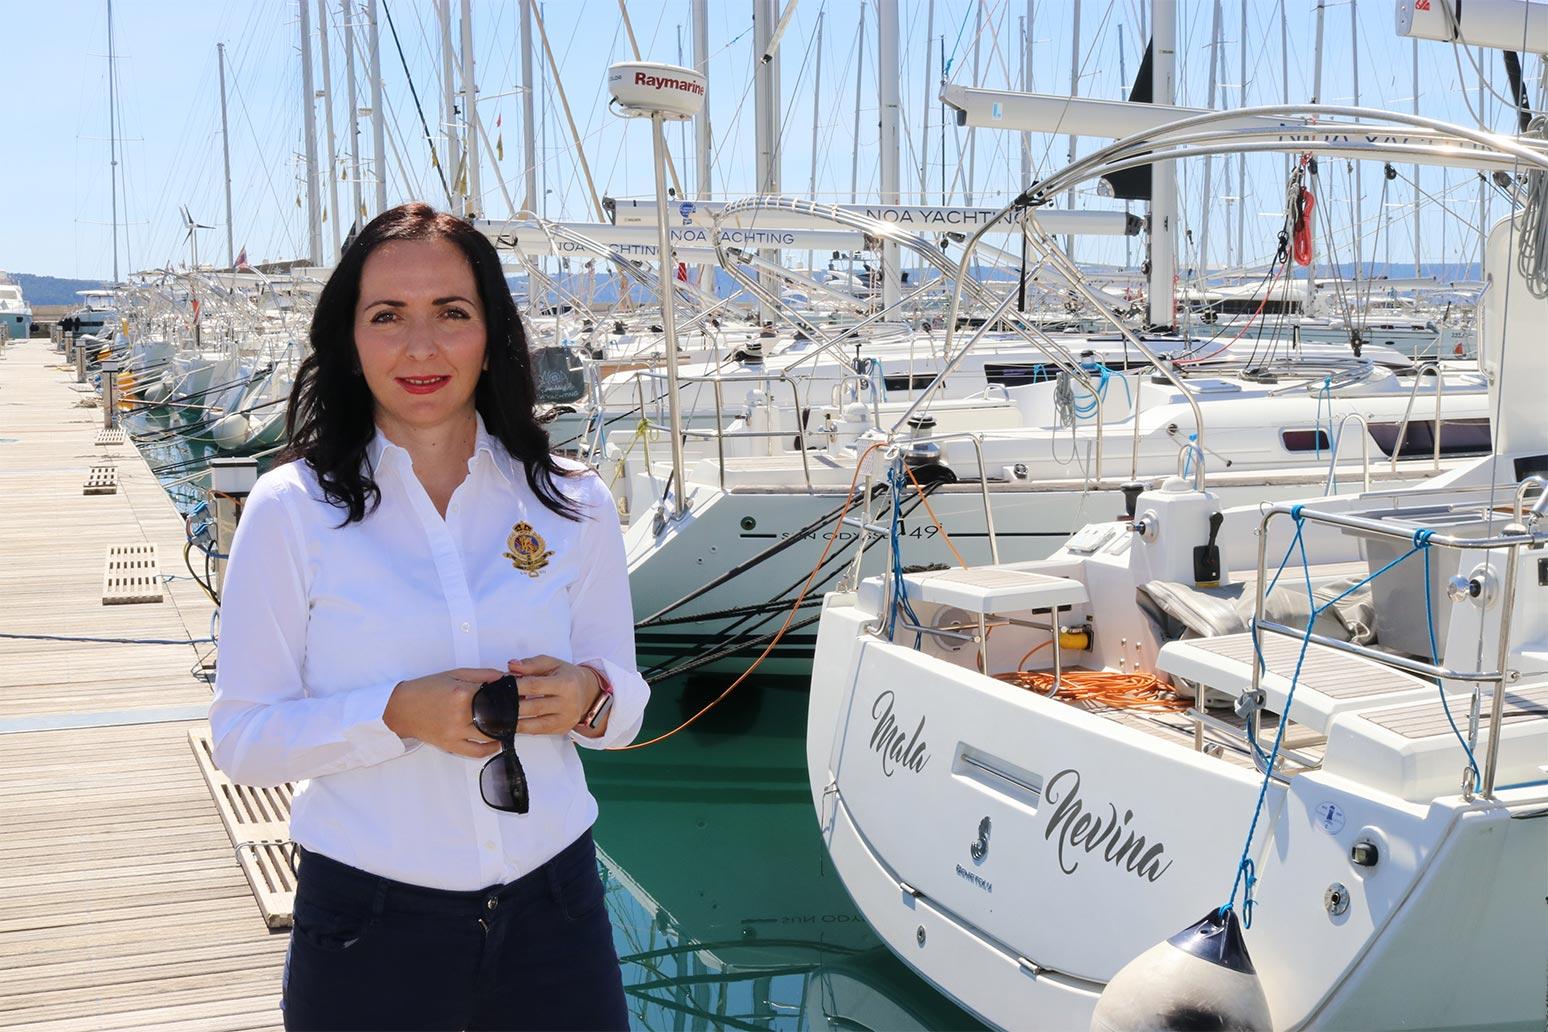 Noa Yachting Charter Management Program